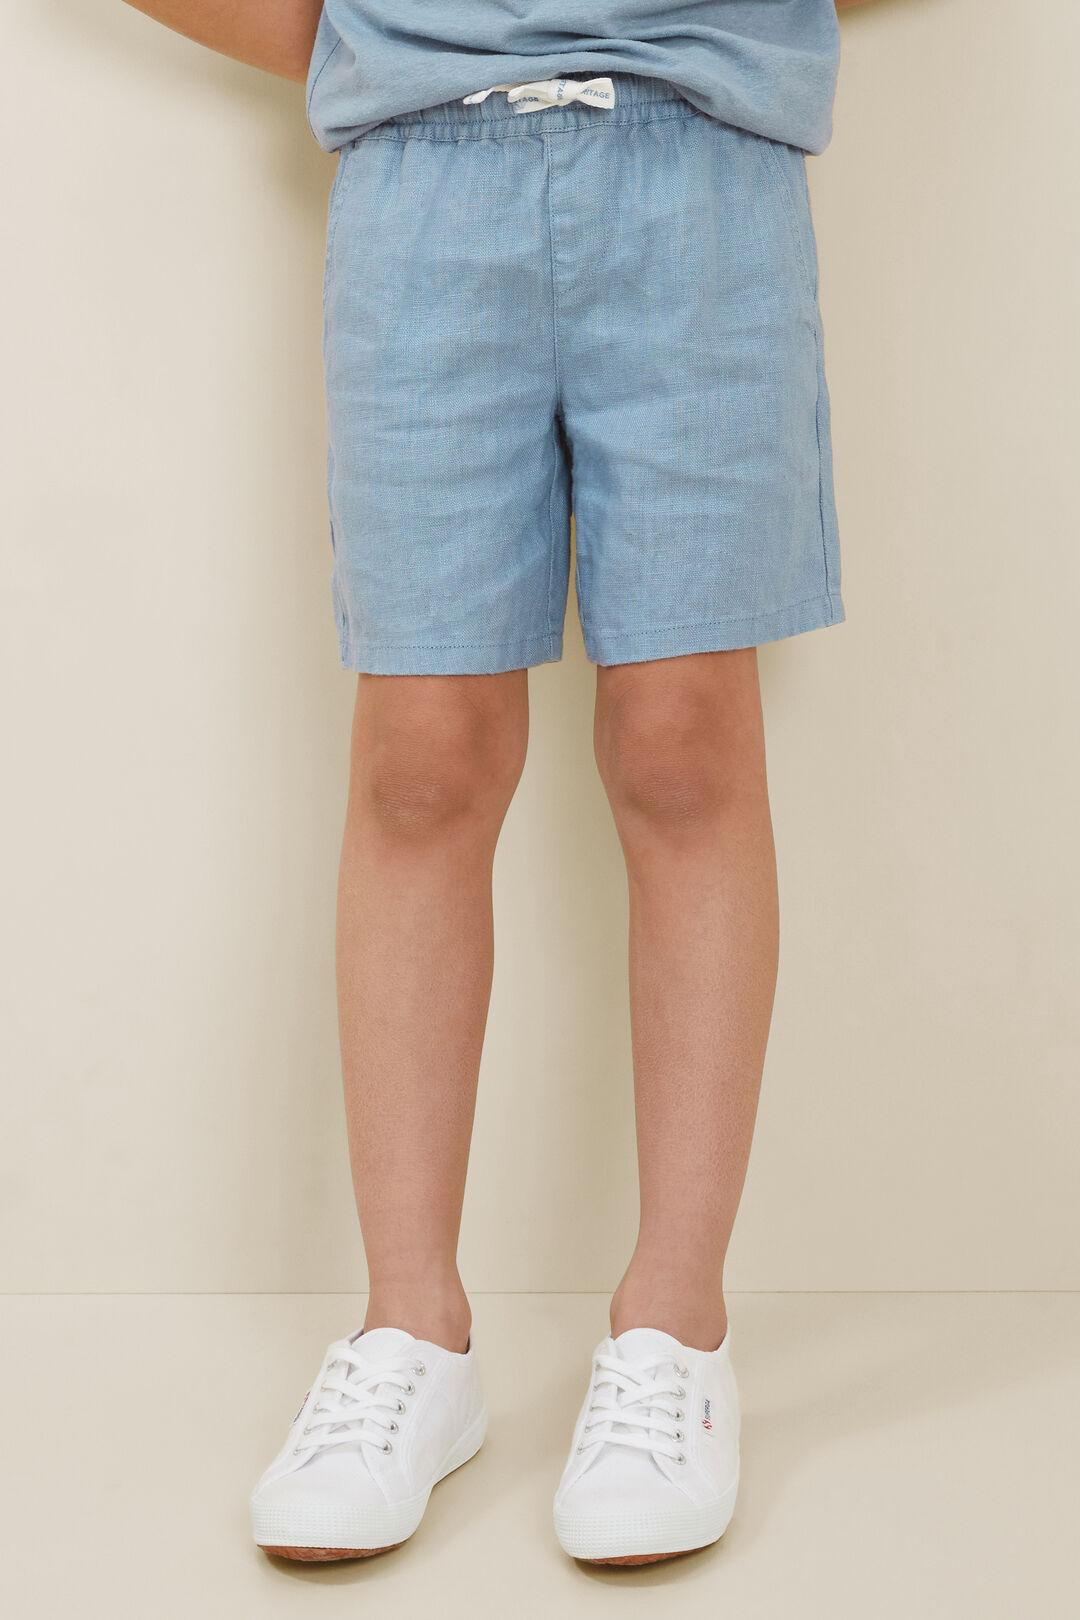 Child LinenShorts  Steel Blue  hi-res